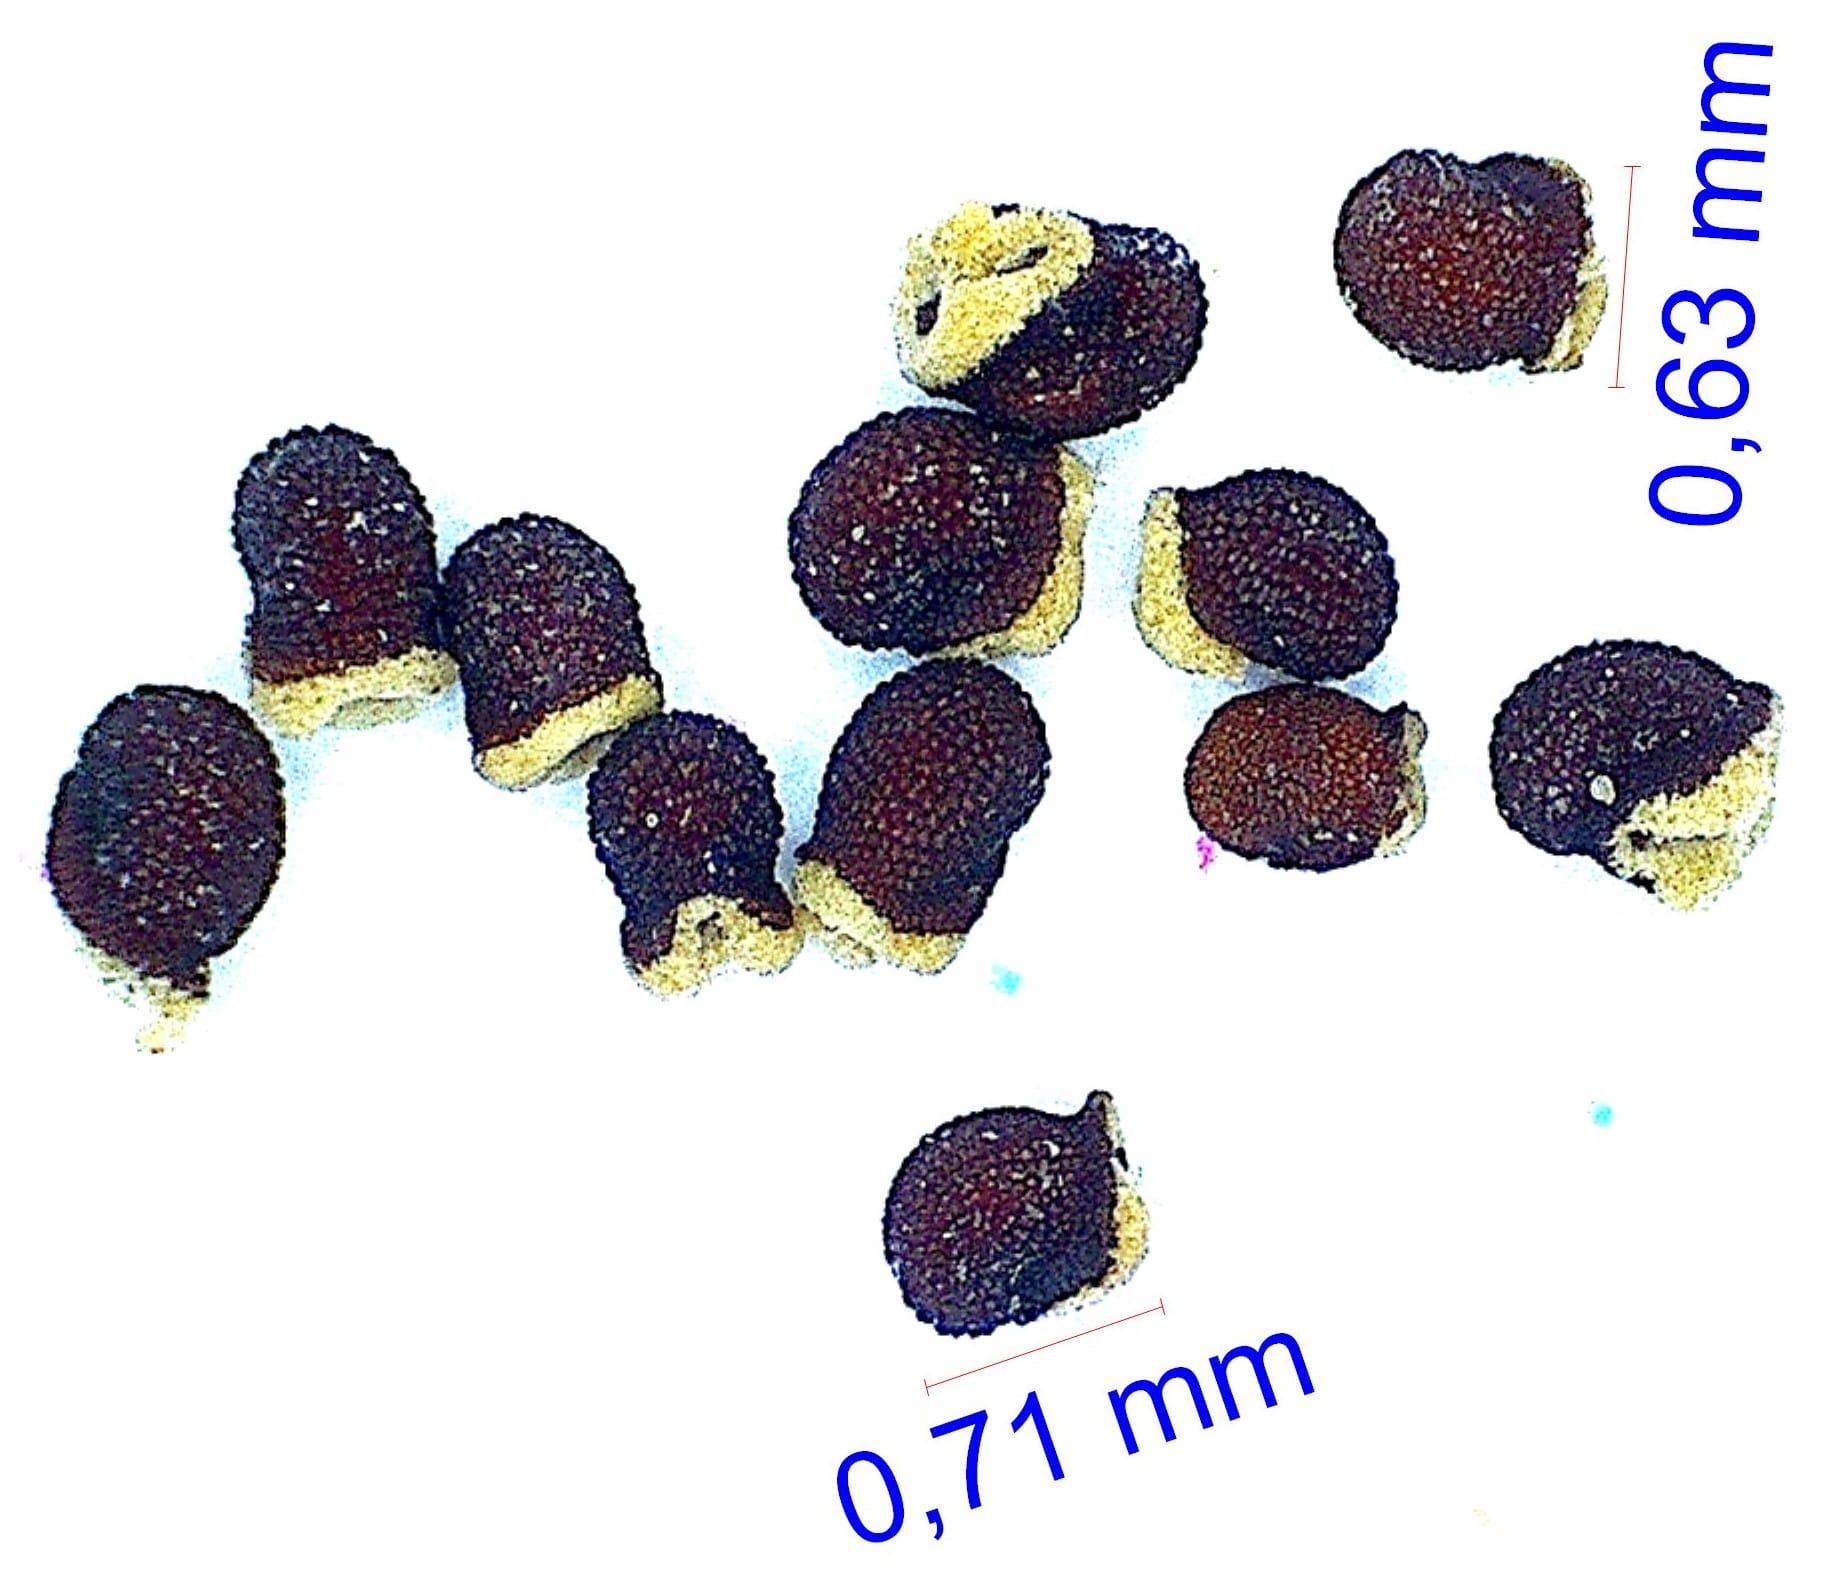 Gymnocalycium oenanthemum (tillianum WR 227). © Joël Lodé/cactus-aventures.com